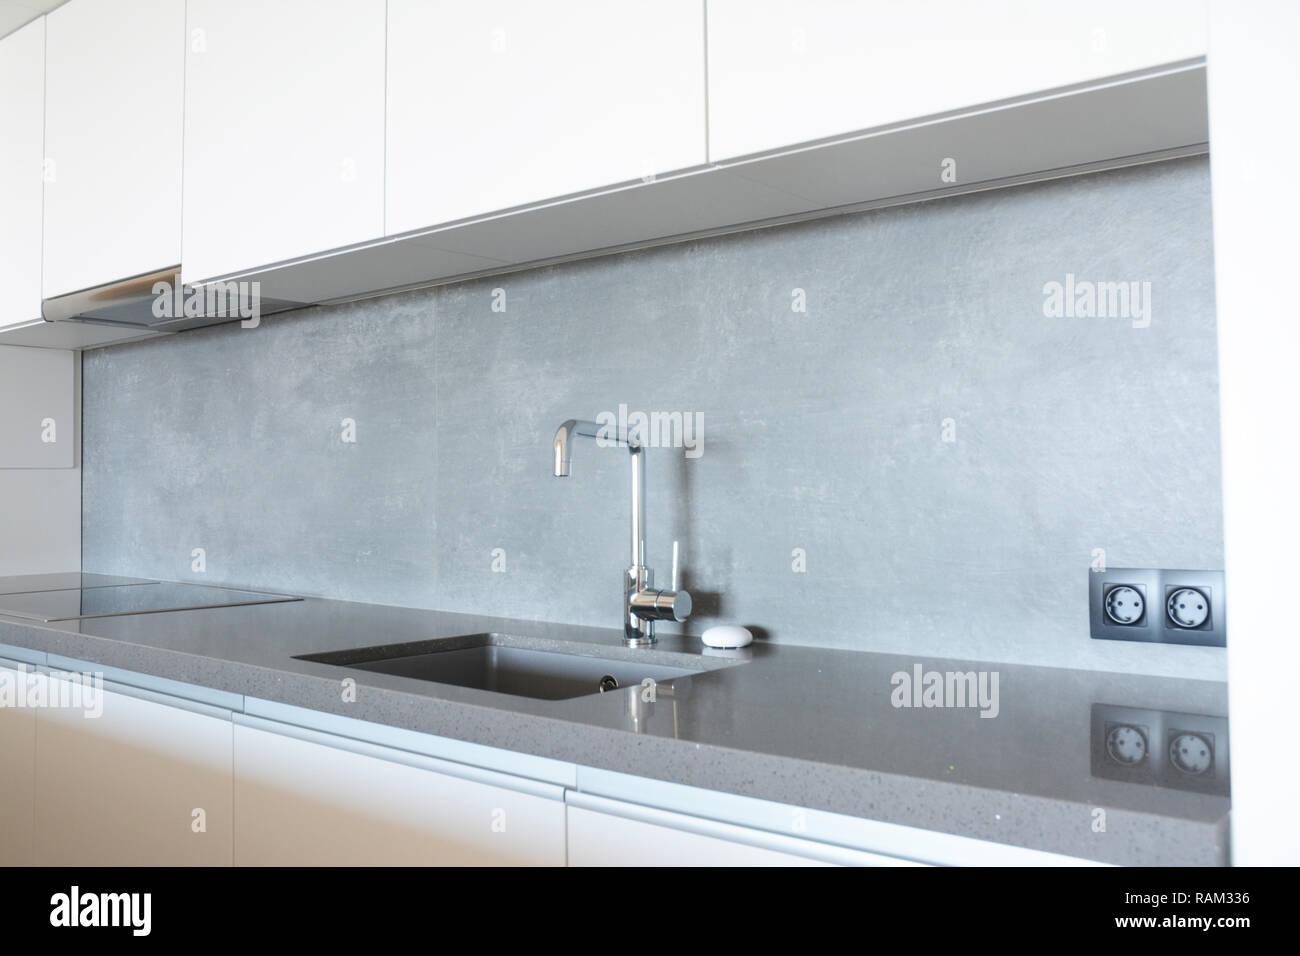 Modern kitchen with metal faucet,  ceramic kitchen sink, kitchen stove, kitchen hood - Stock Image